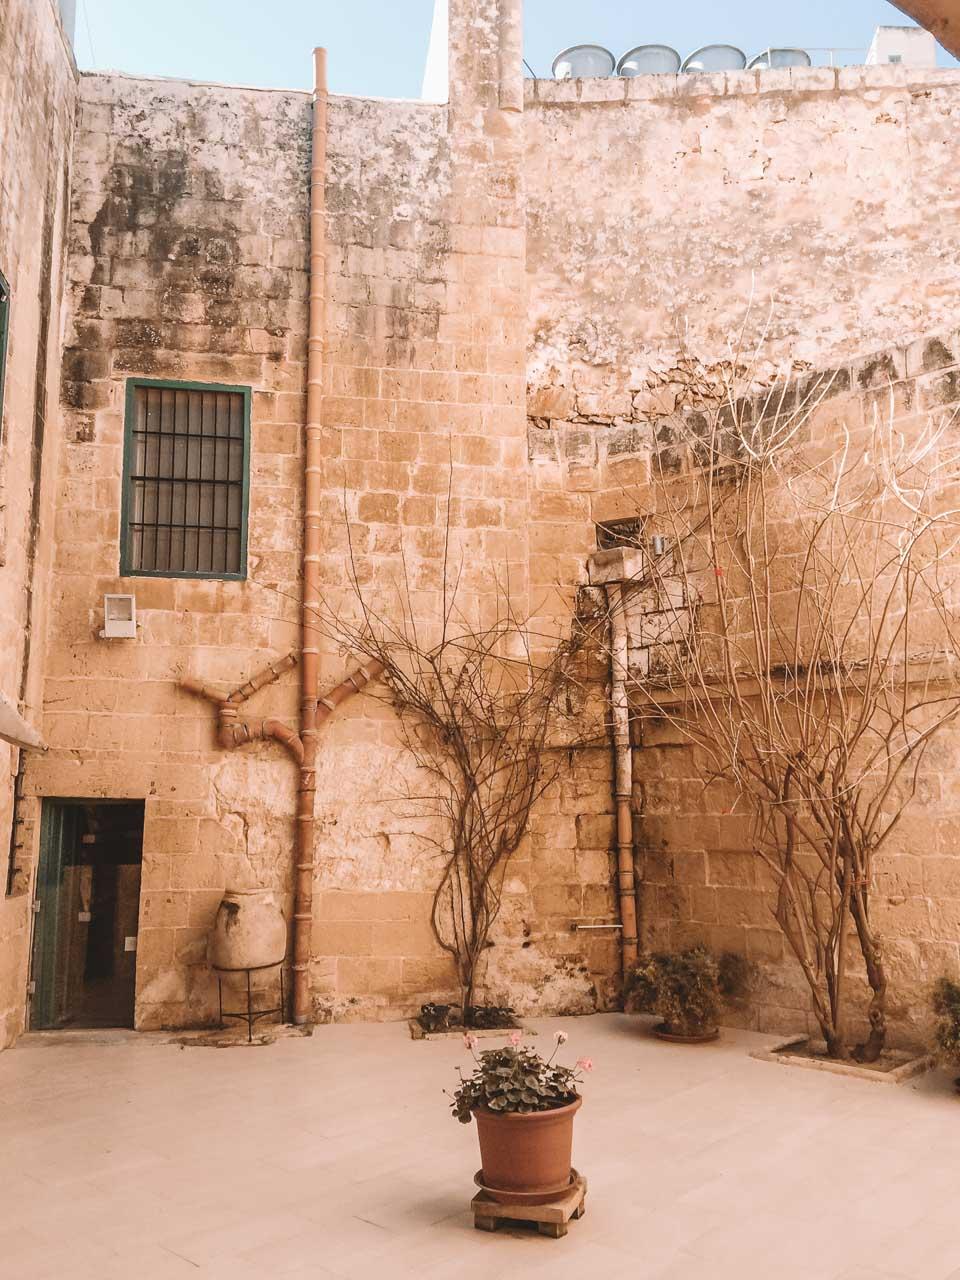 Courtyard at the Wignacourt Museum in Rabat, Malta